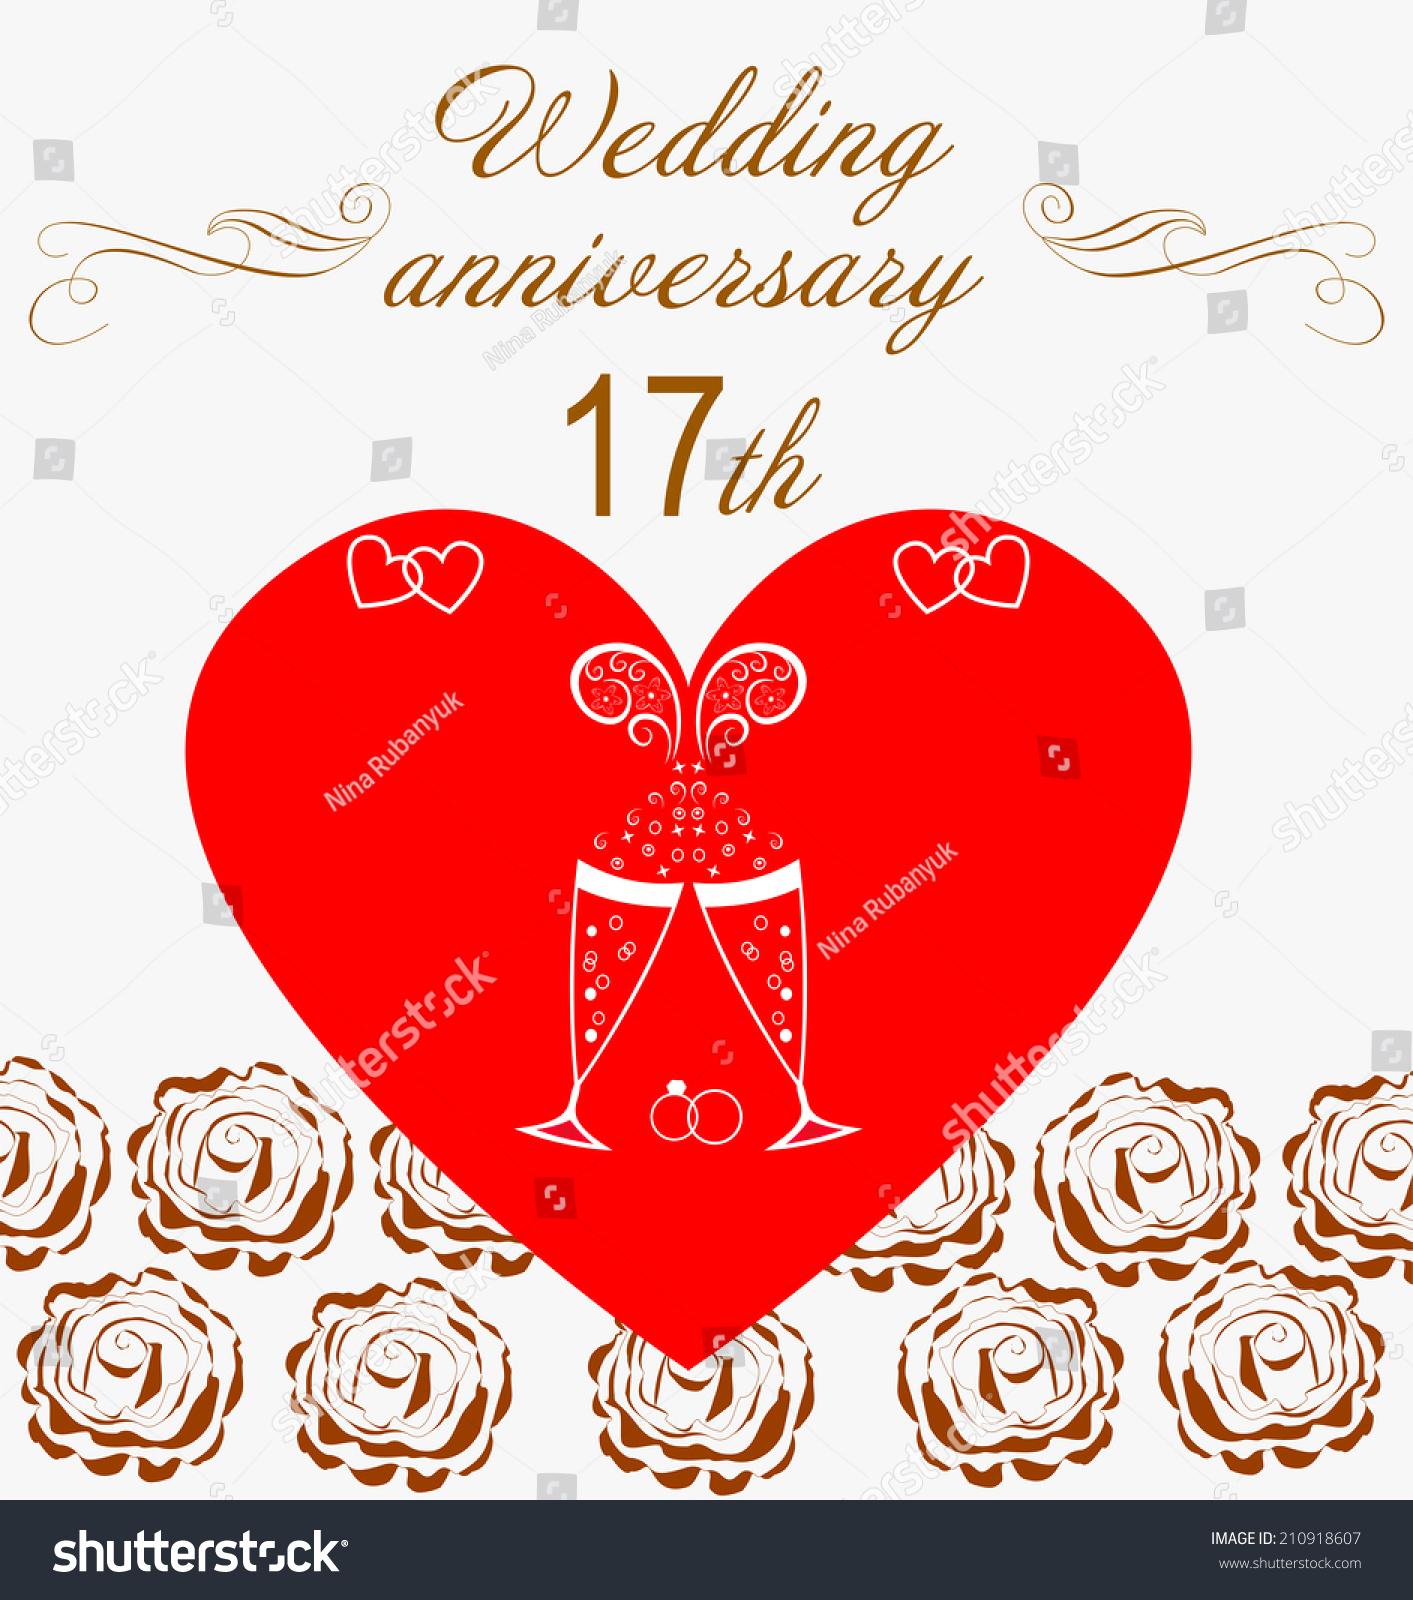 17 Th Wedding Anniversary Invitation Stock Vector (Royalty Free ...